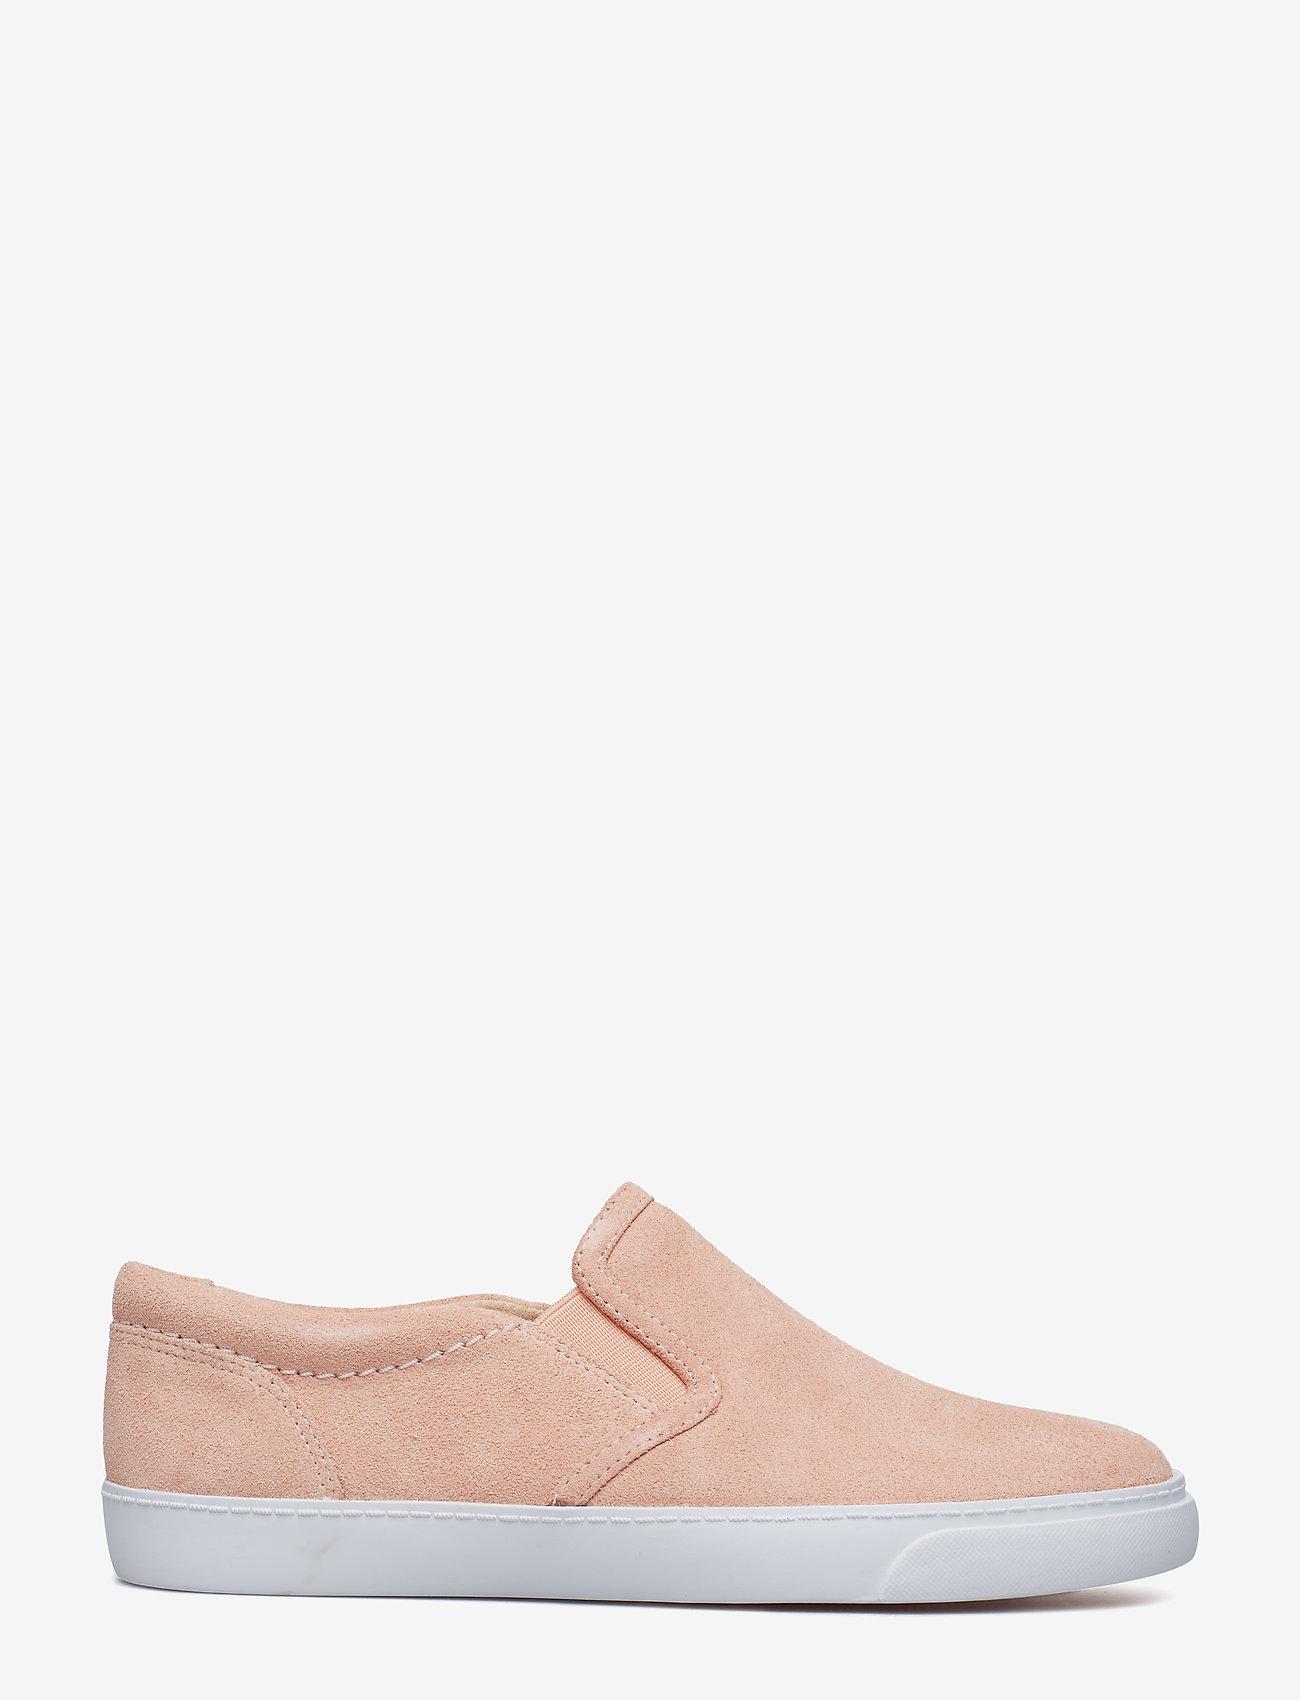 Clarks - Glove Puppet - slip-on sneakers - light pink - 1